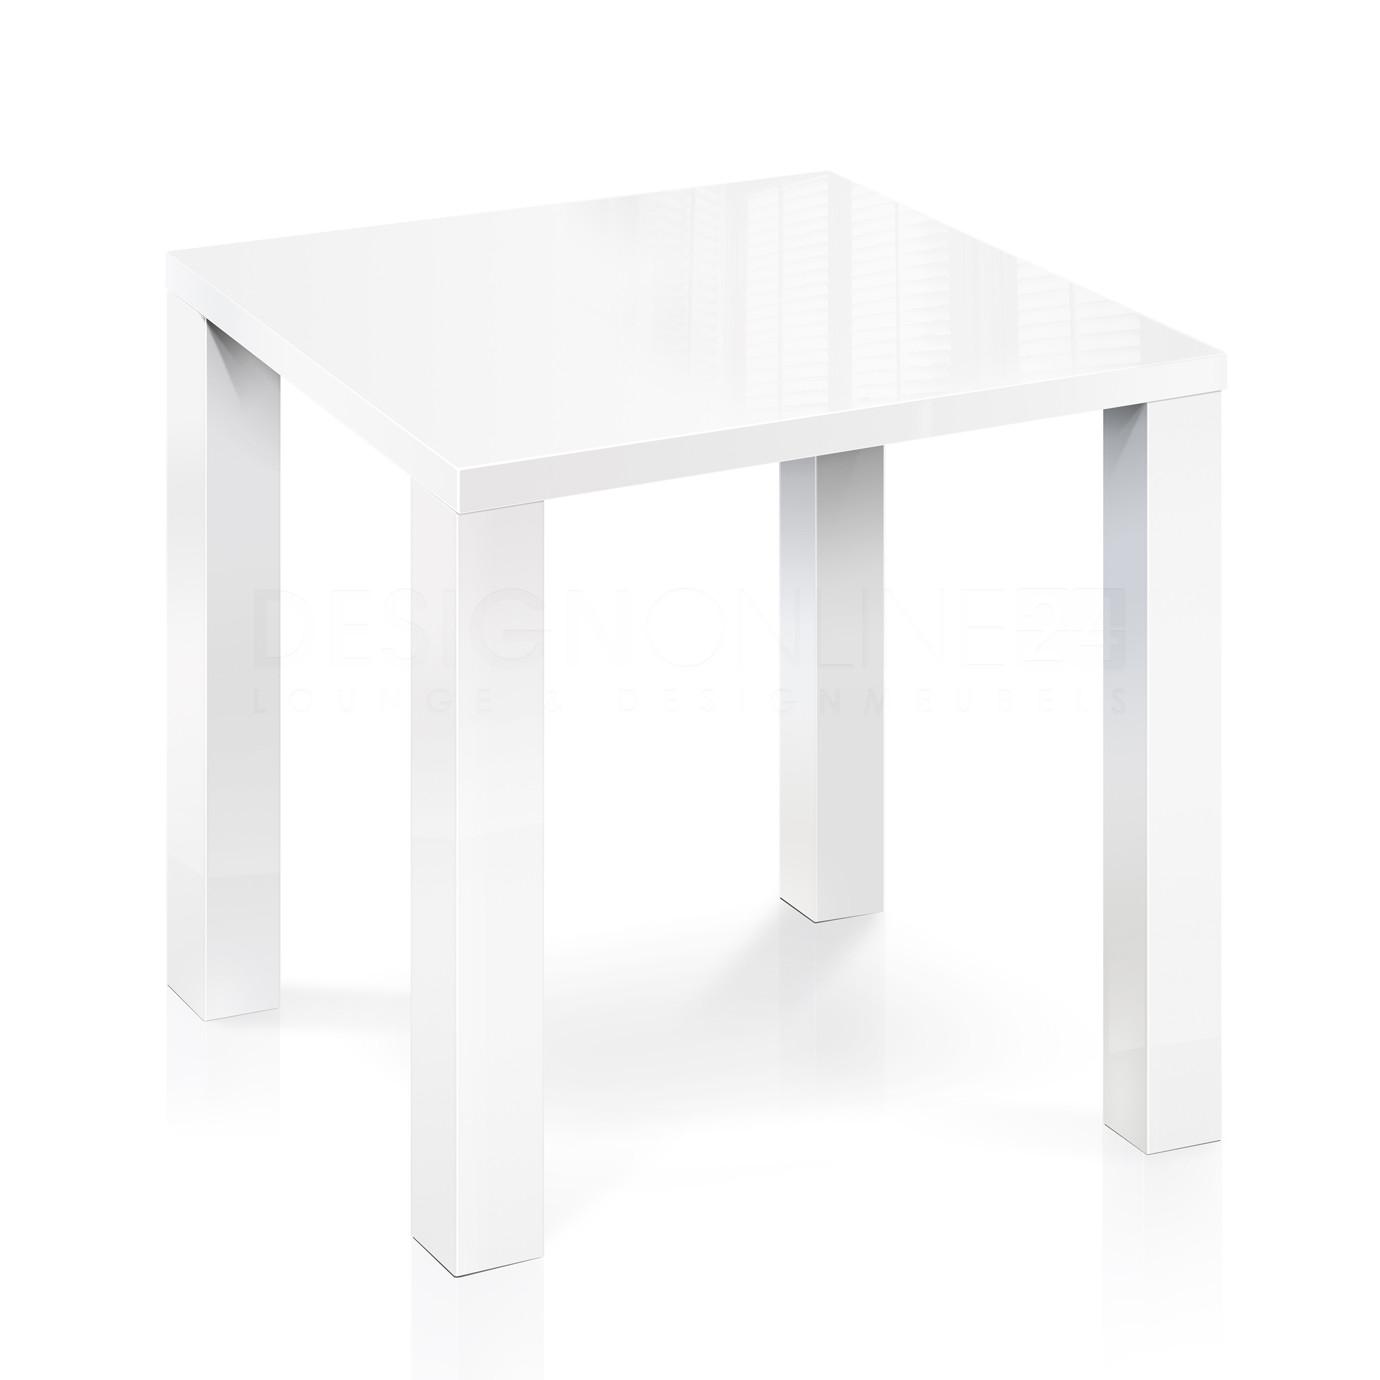 Hoogglans Keuken Krassen : 24designs Bartafel High Gloss L100 X B100 X H92 Cm Wit Tafelblad Witte